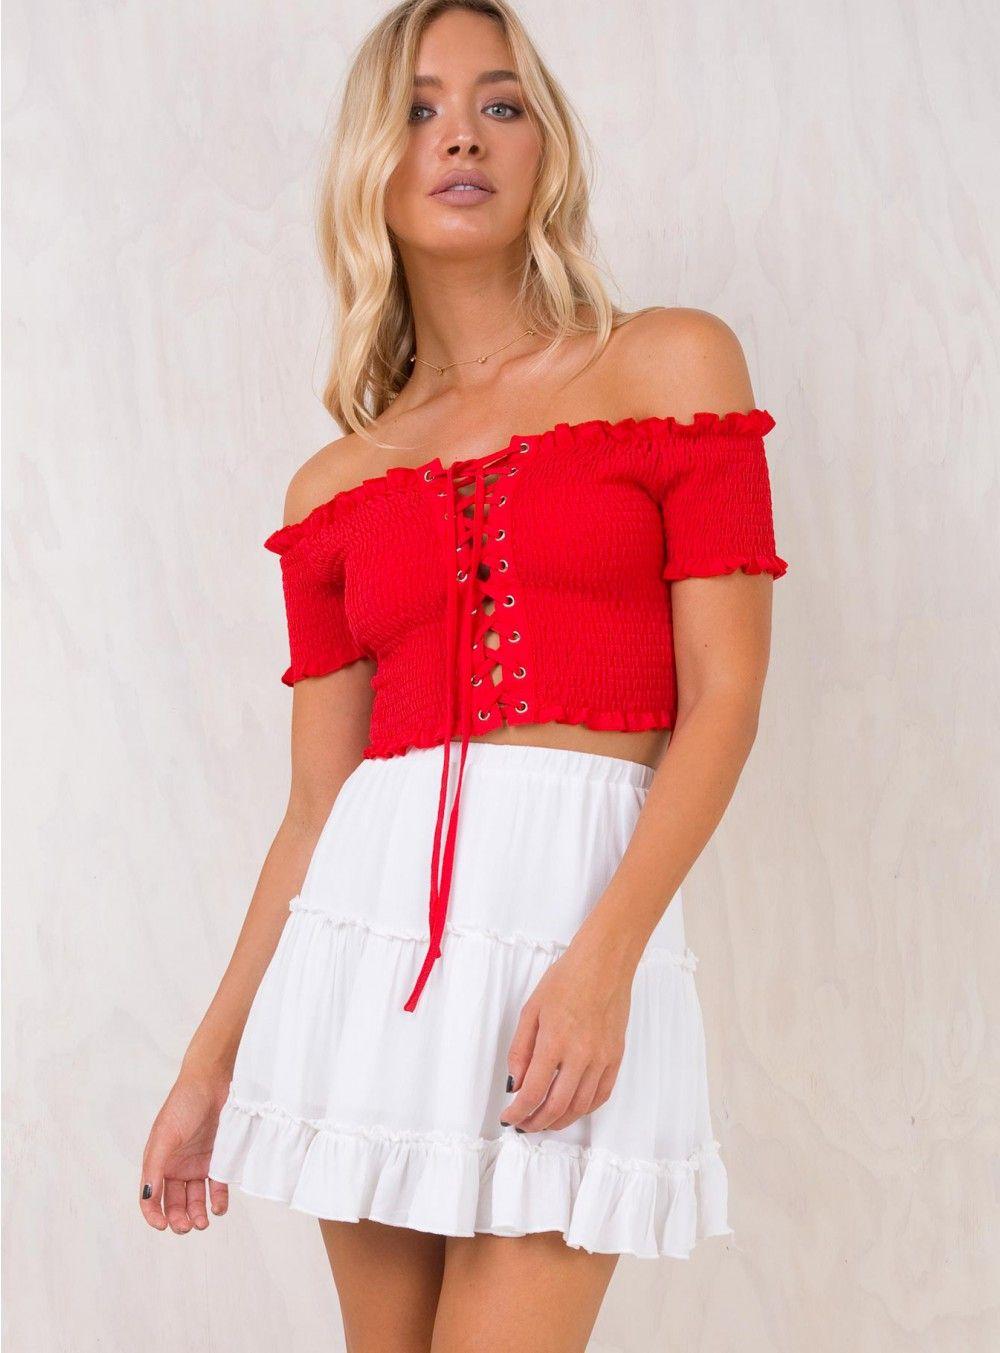 bb29e10384 Marlowe Mini Skirt Outfit Posts